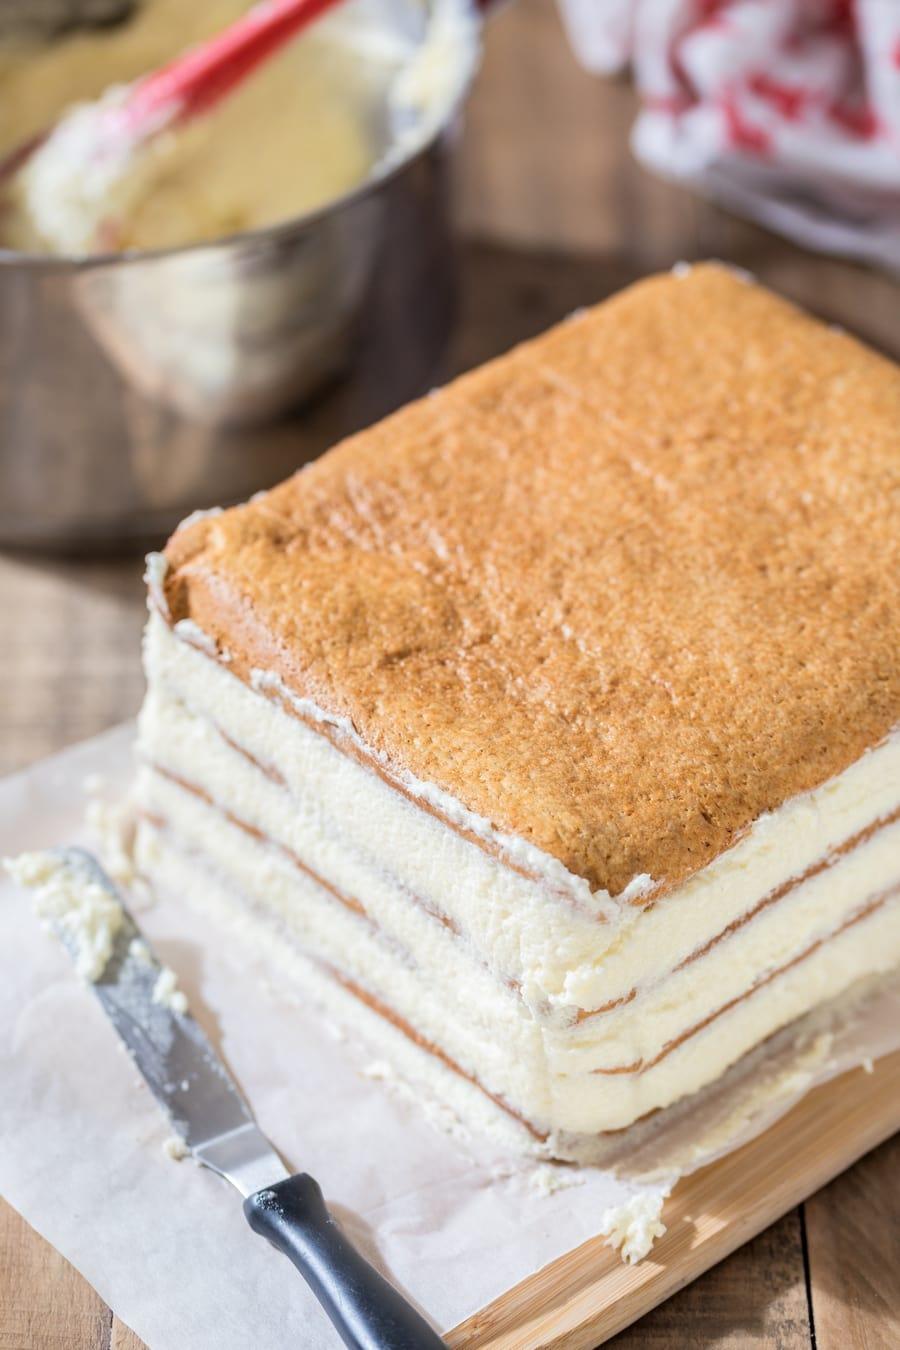 Assembling layers of Polish honey cake.